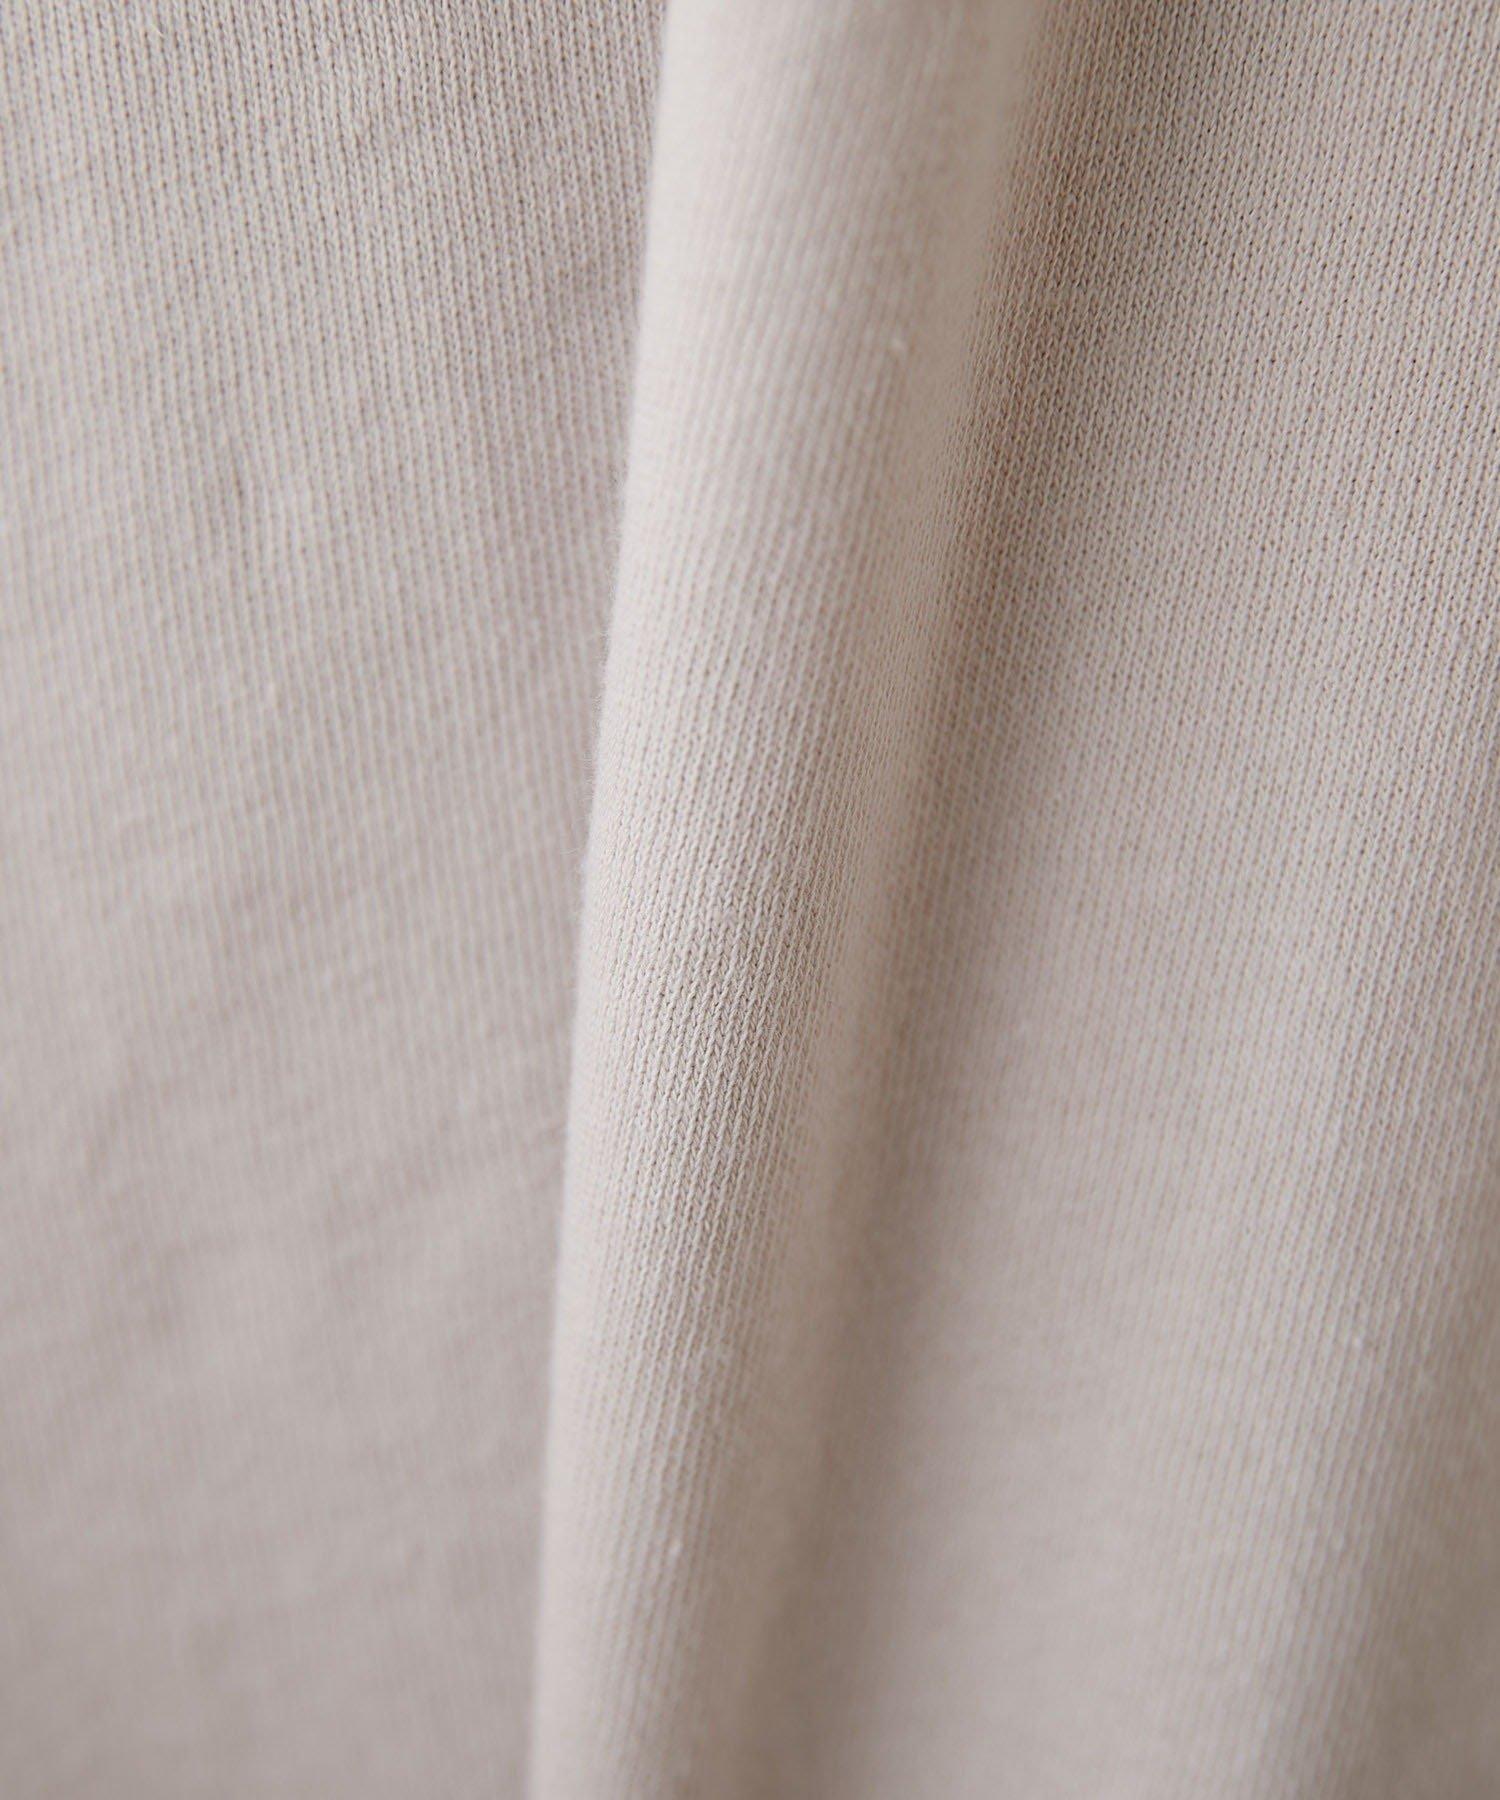 CIAOPANIC TYPY(チャオパニックティピー) 綿麻ポンチョプリントスウェット